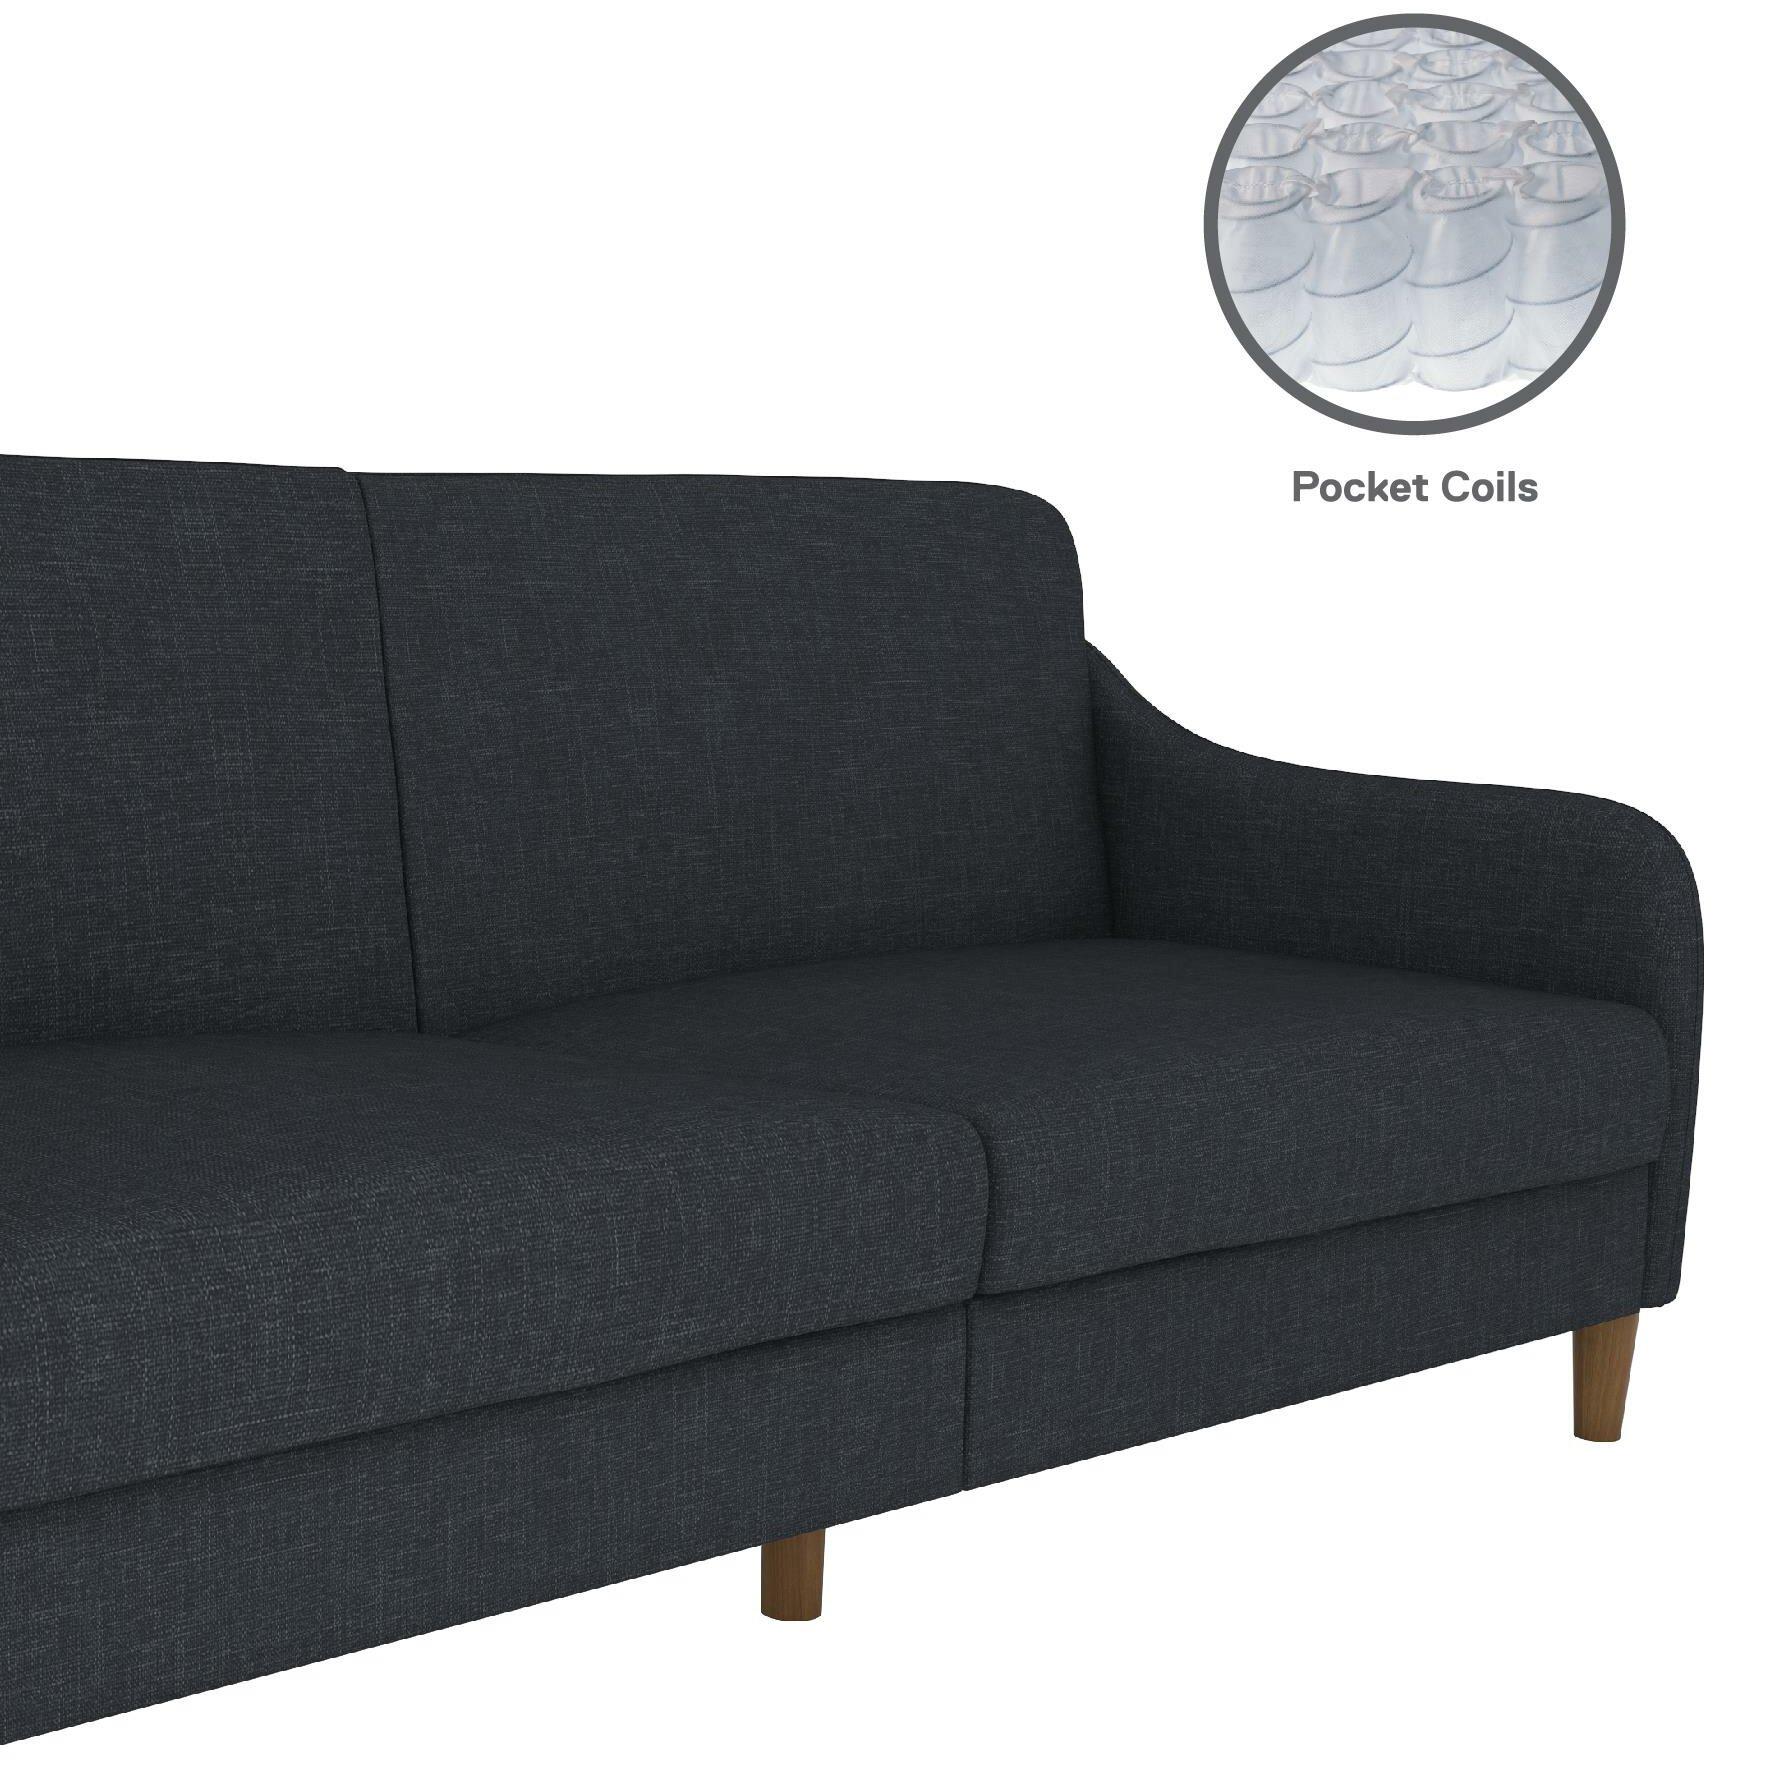 Everly Convertible Sofa Reviews